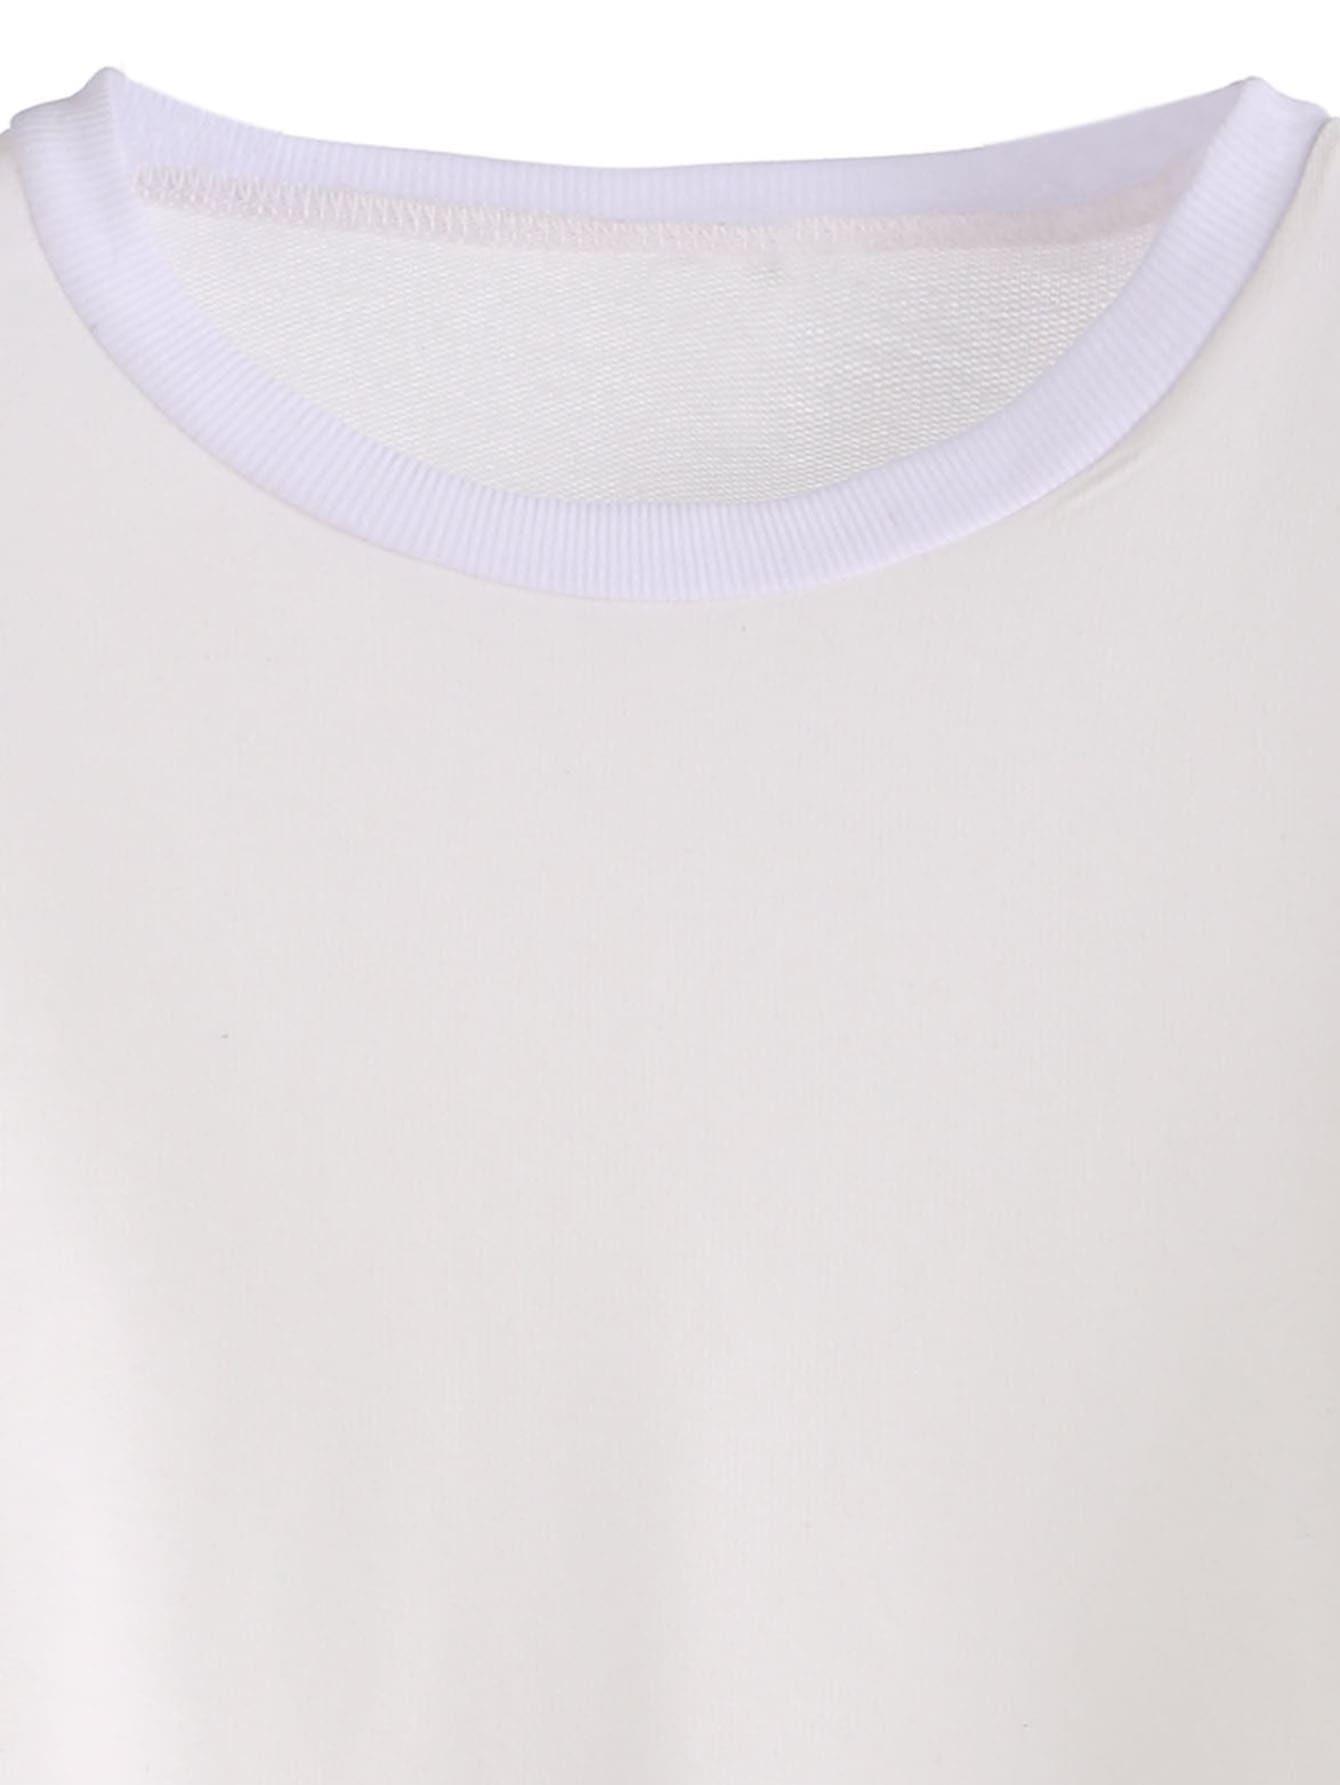 c94b8537451 White Varsity Striped Sleeve Crop T-shirt EmmaCloth-Women Fast ...